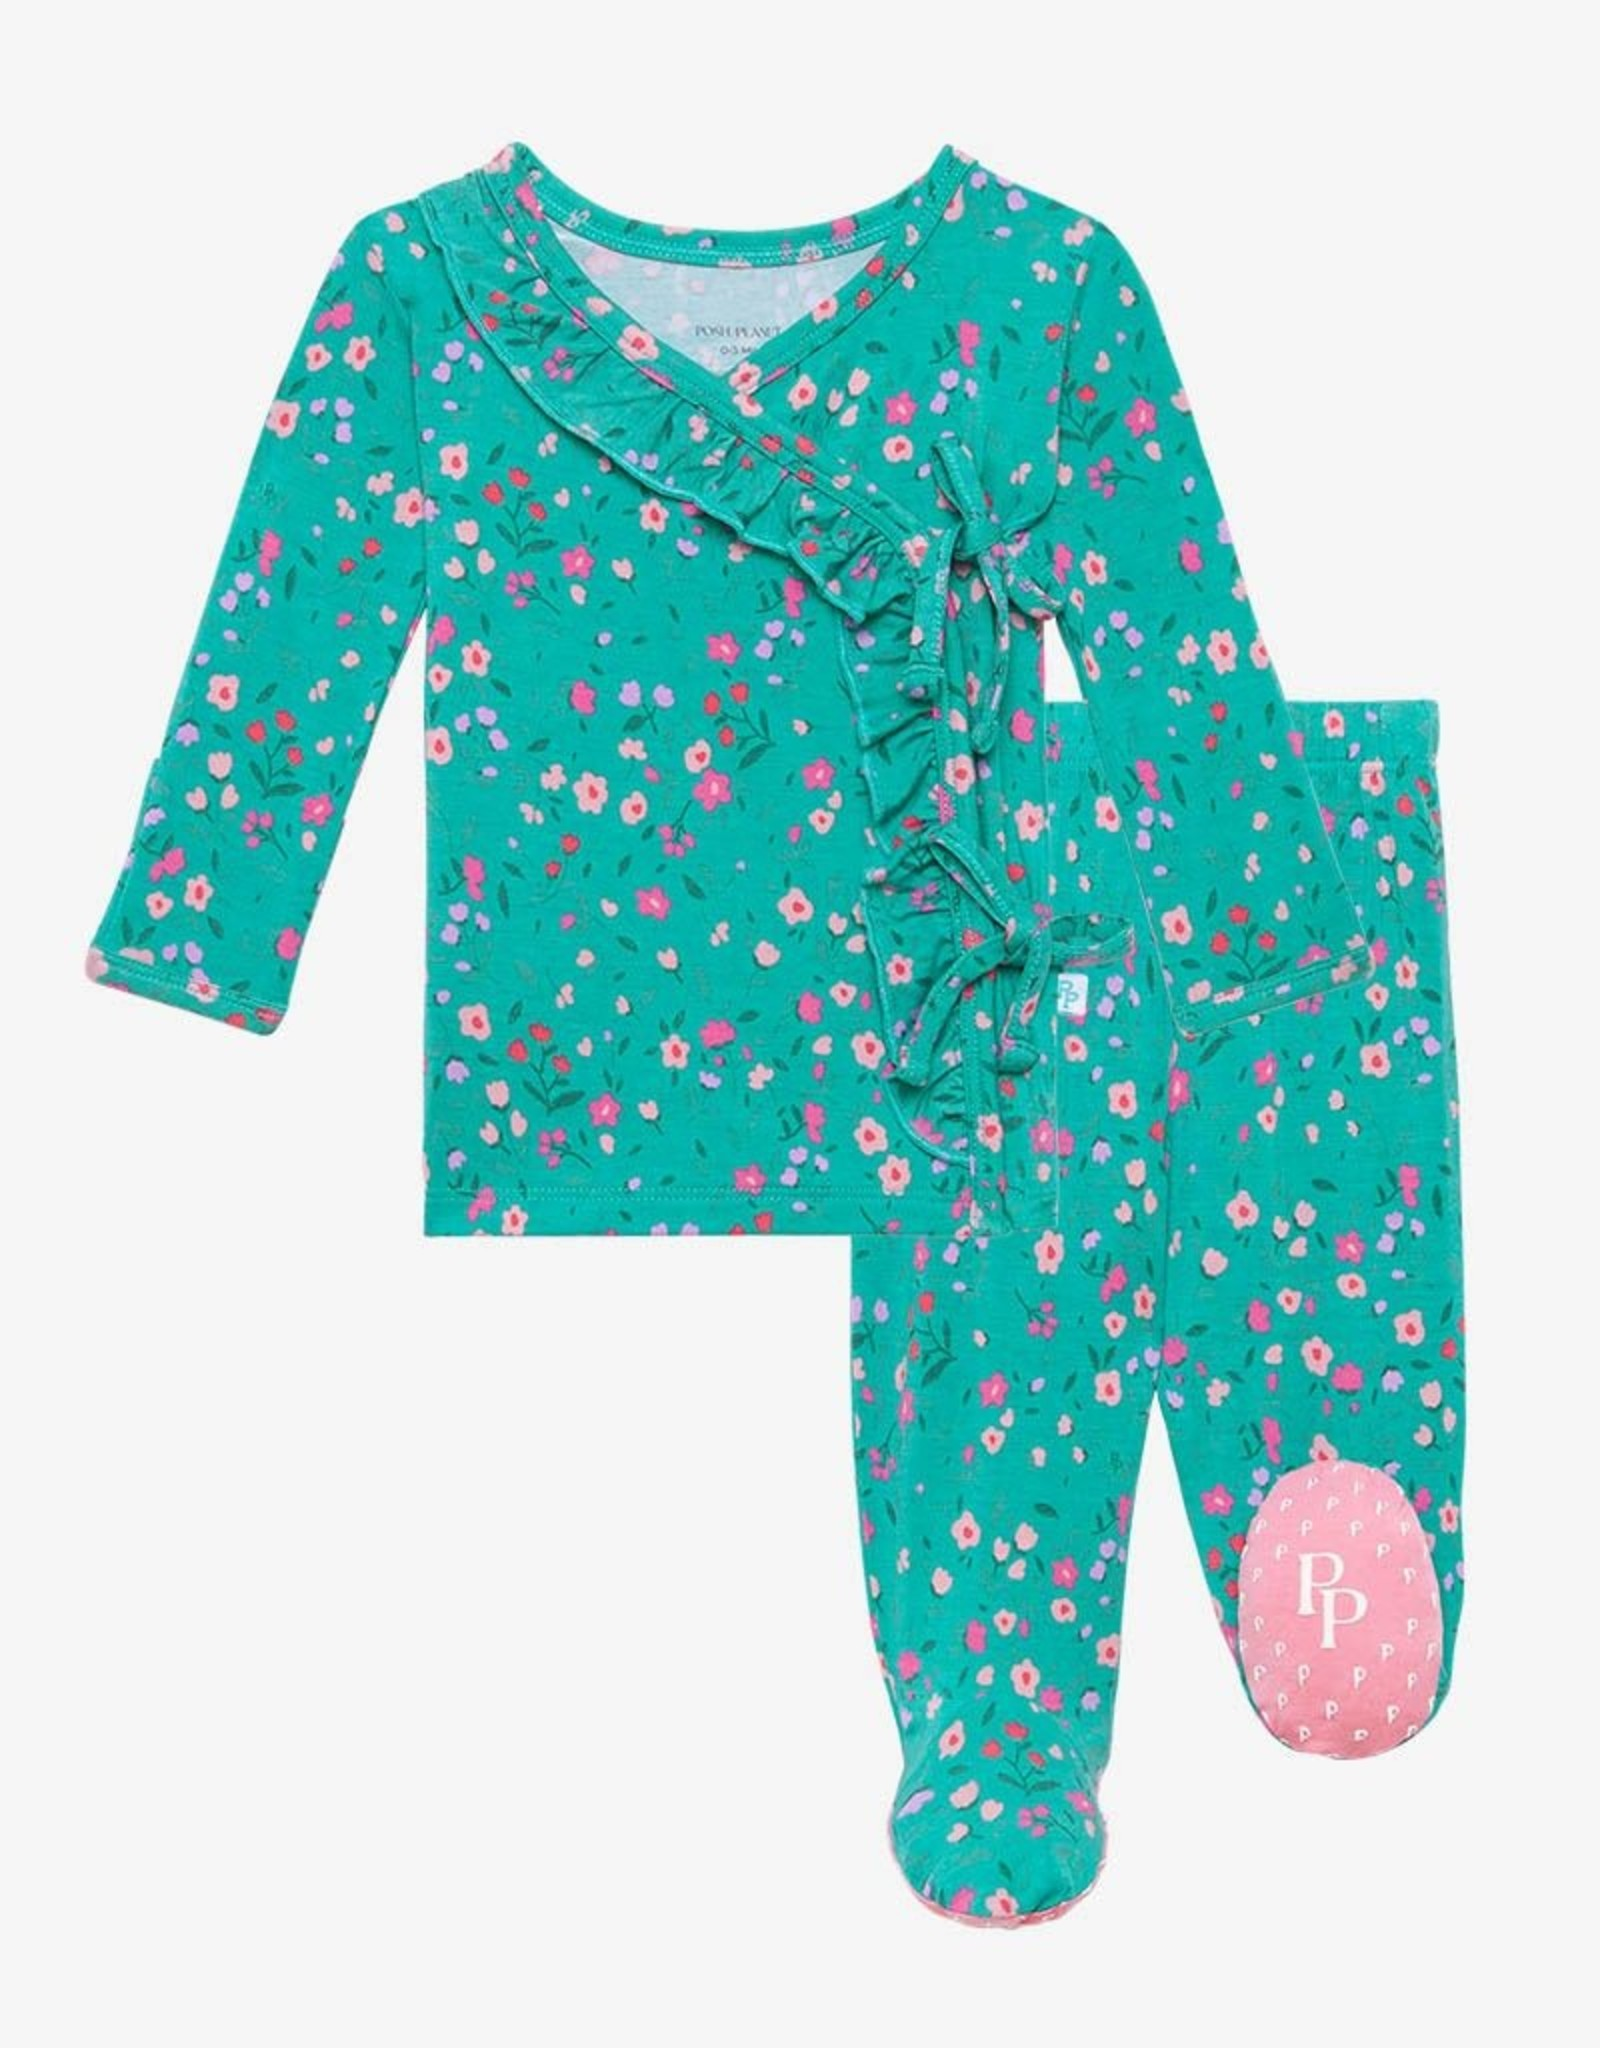 Posh Peanut Cassandra Ruffled Kimono 0-3 months